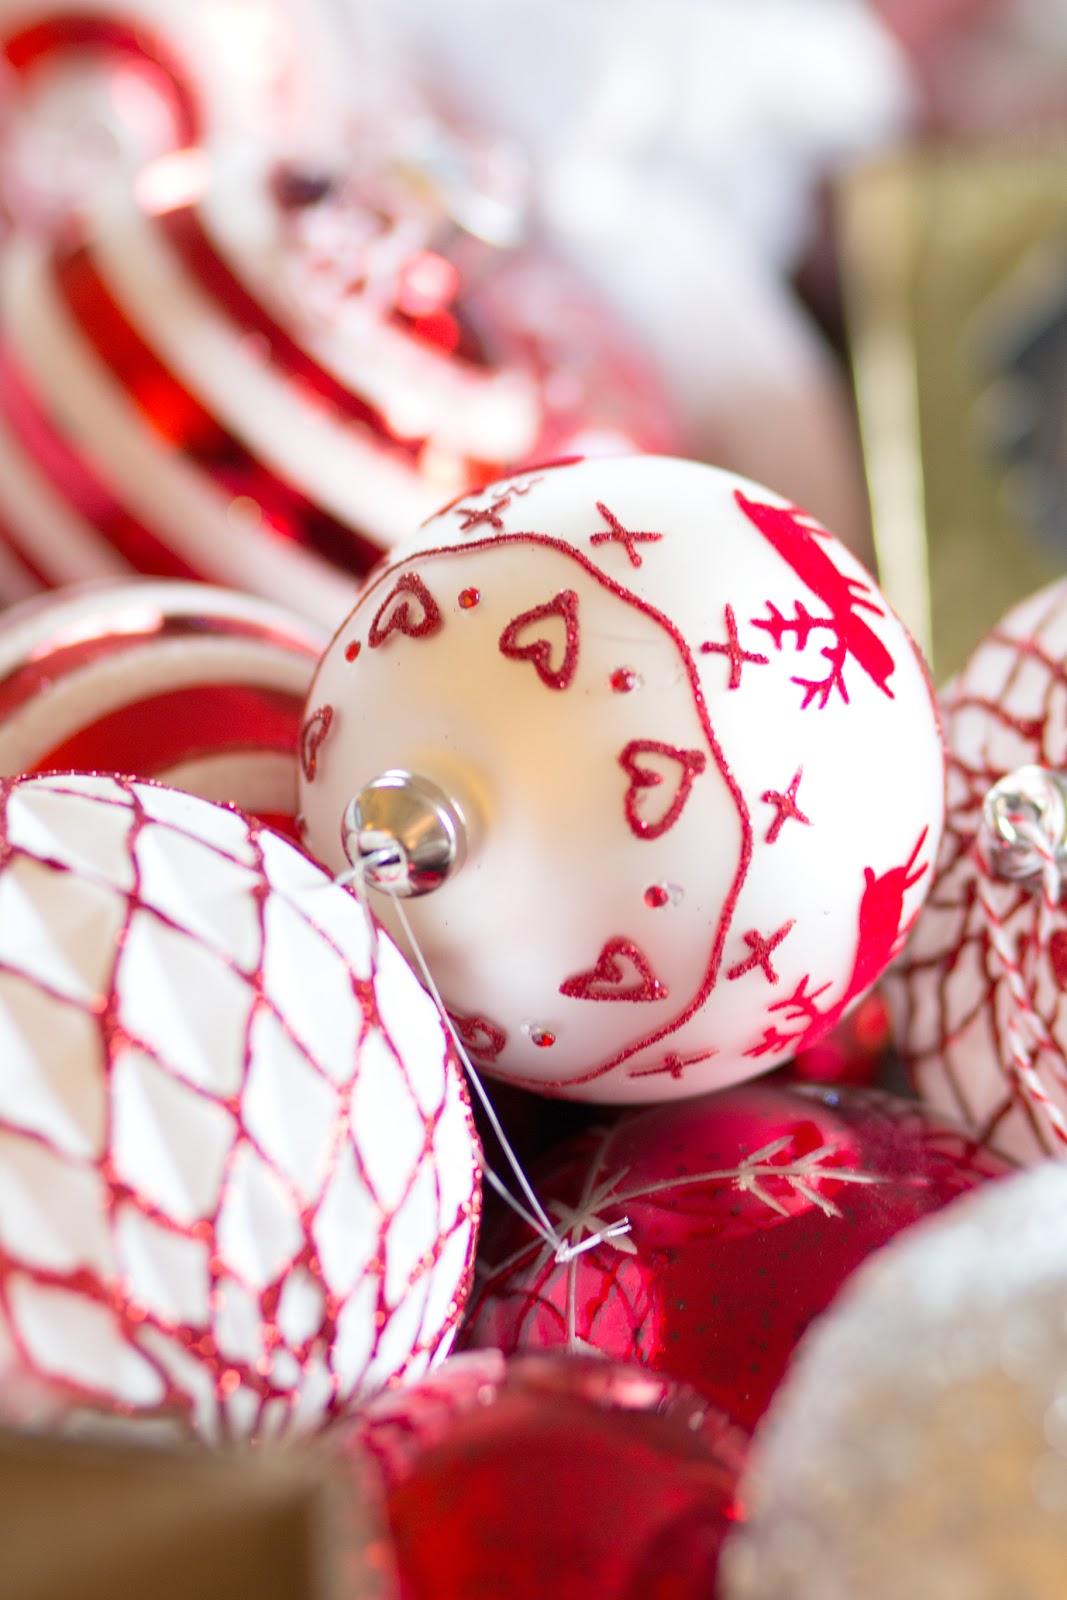 THE VIDEO: DECORATING THE CHRISTMAS TREE #VLOGMAS